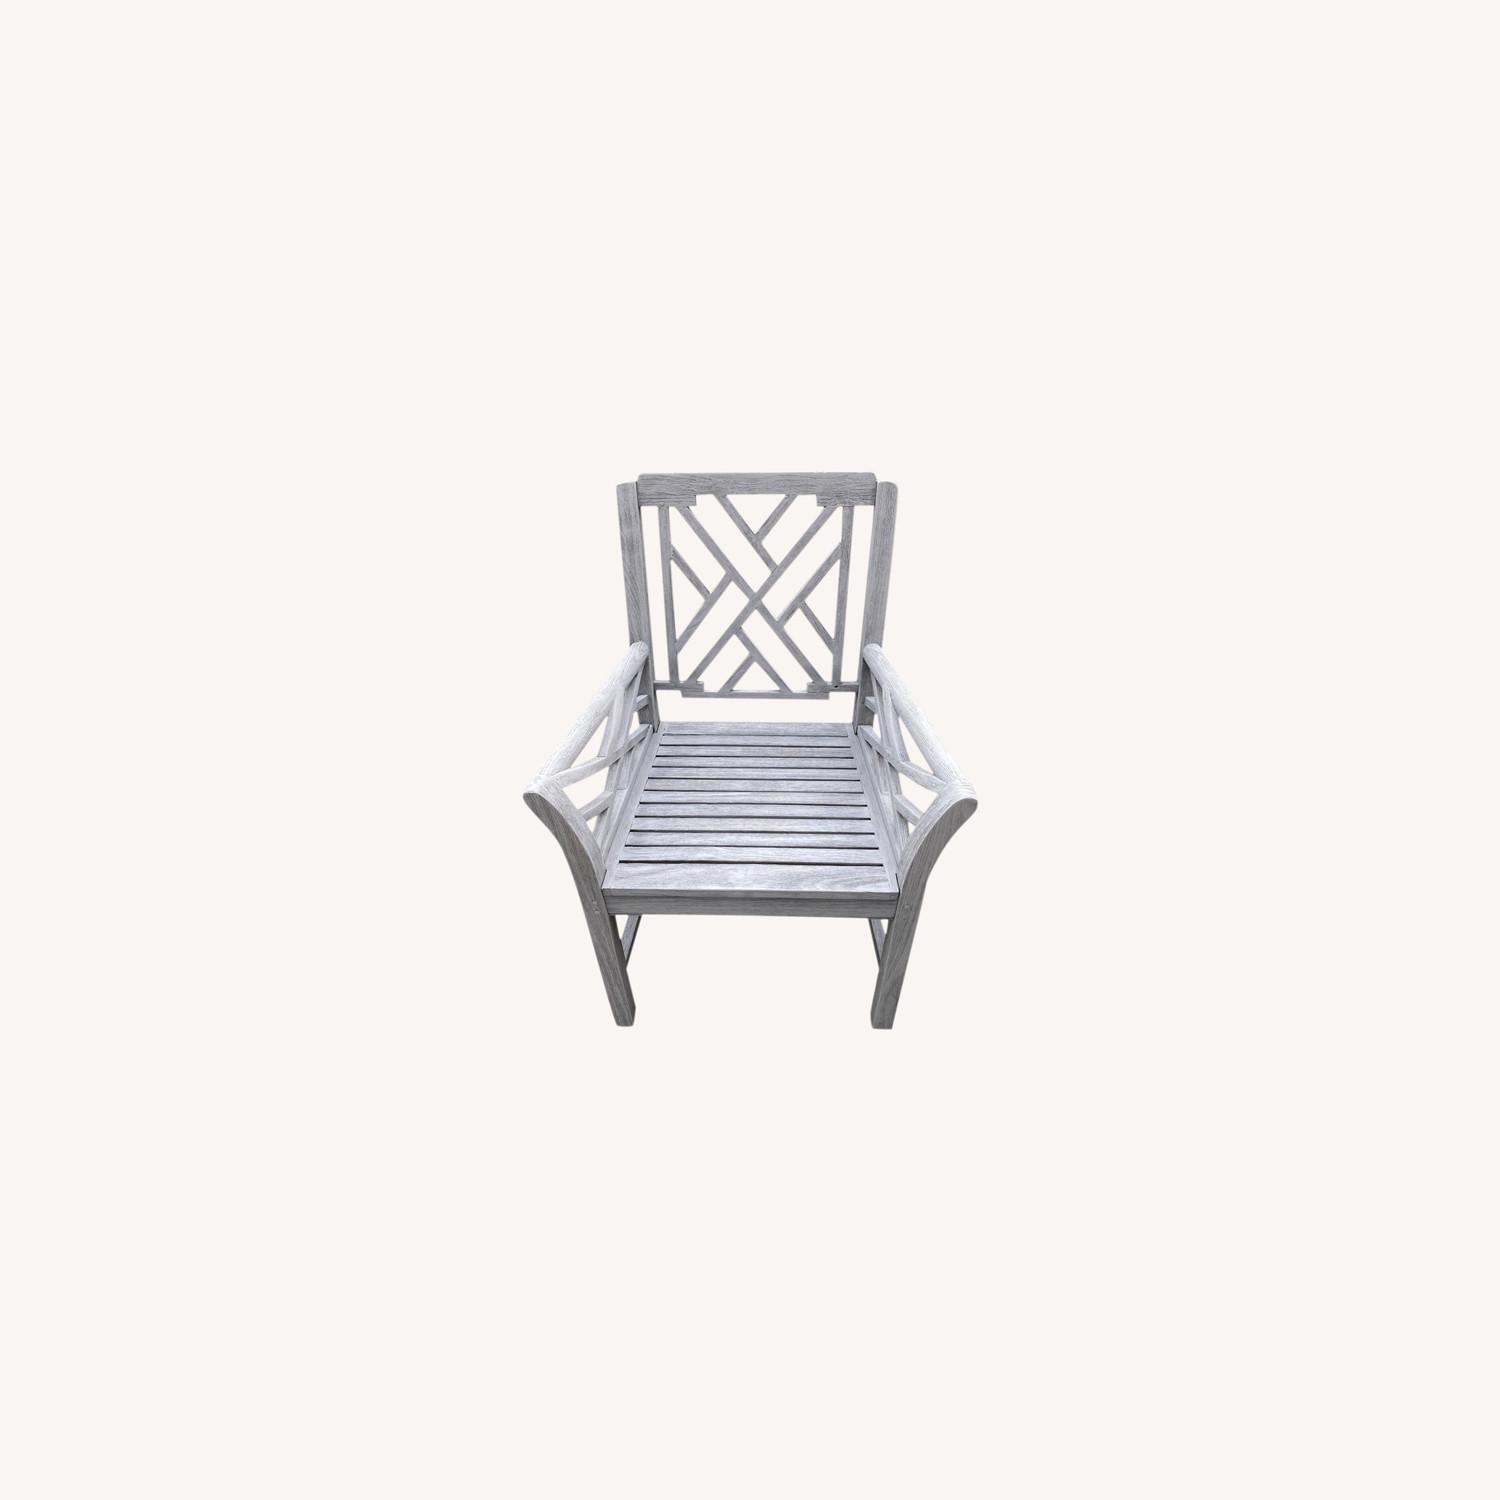 Restoration Hardware Kingston Dining Chairs - image-0